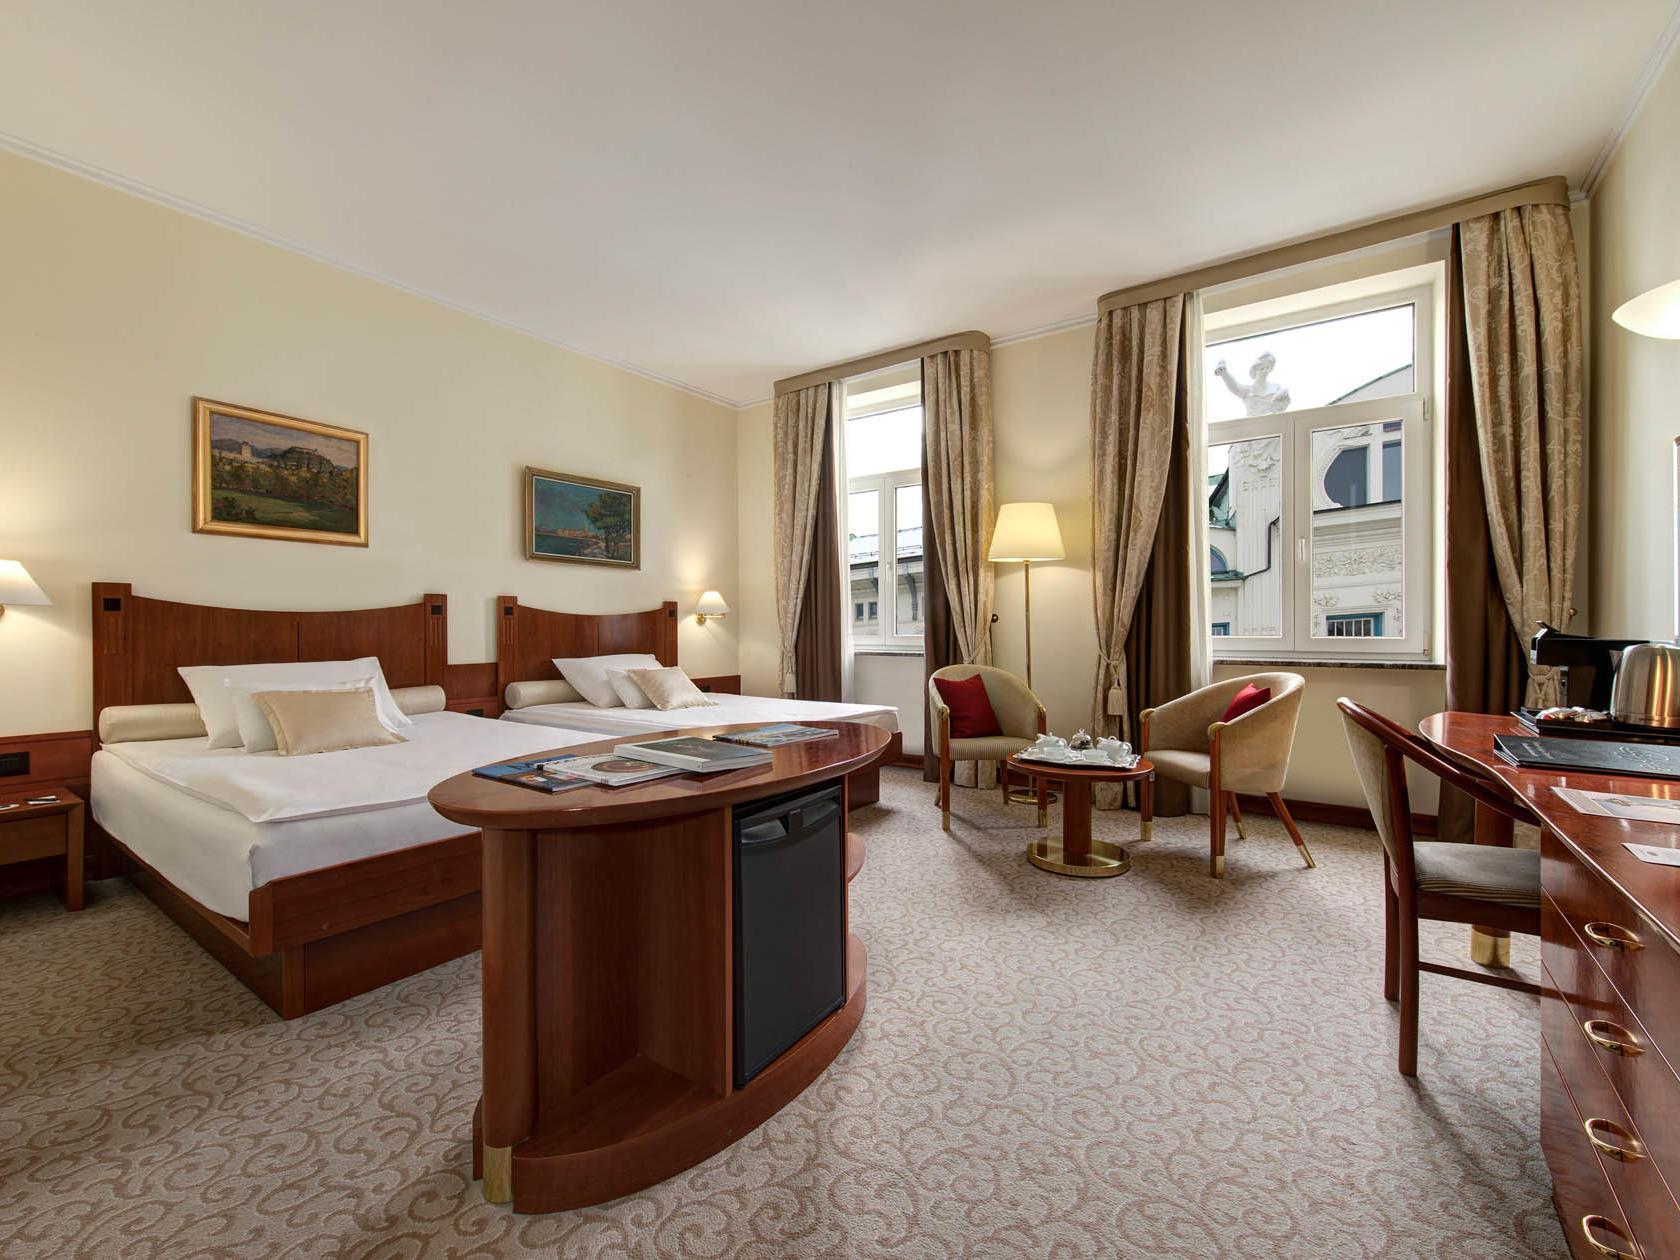 Deluxe Double Room at Grand Hotel Union in Ljubljana